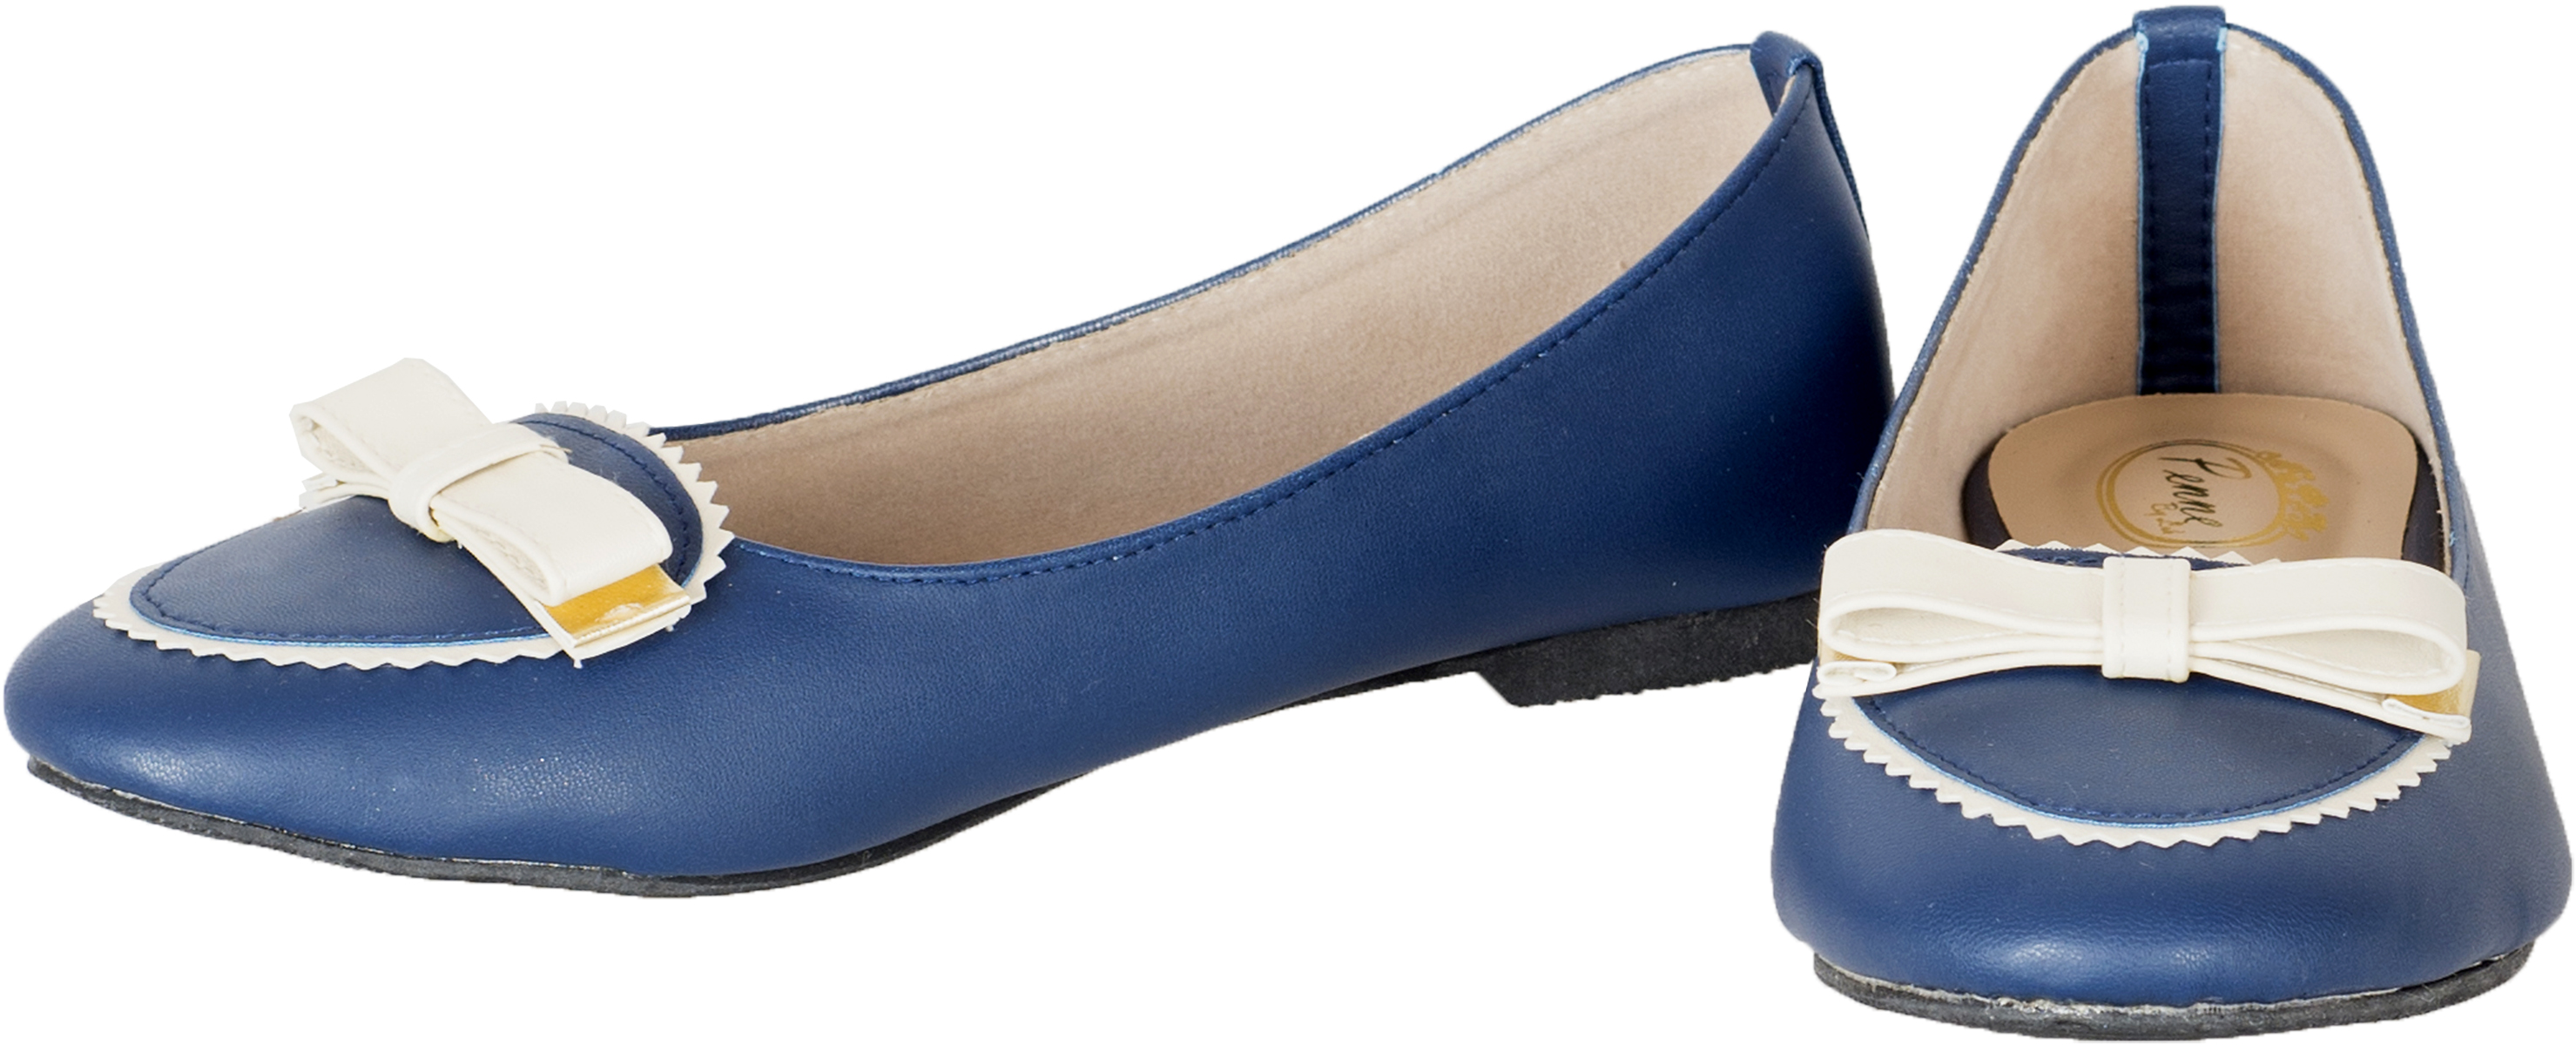 Cute VINTAGE 50s SCHLEIFE Retro BOW Schuhe BALLERINAS Flats Navy Rockabilly